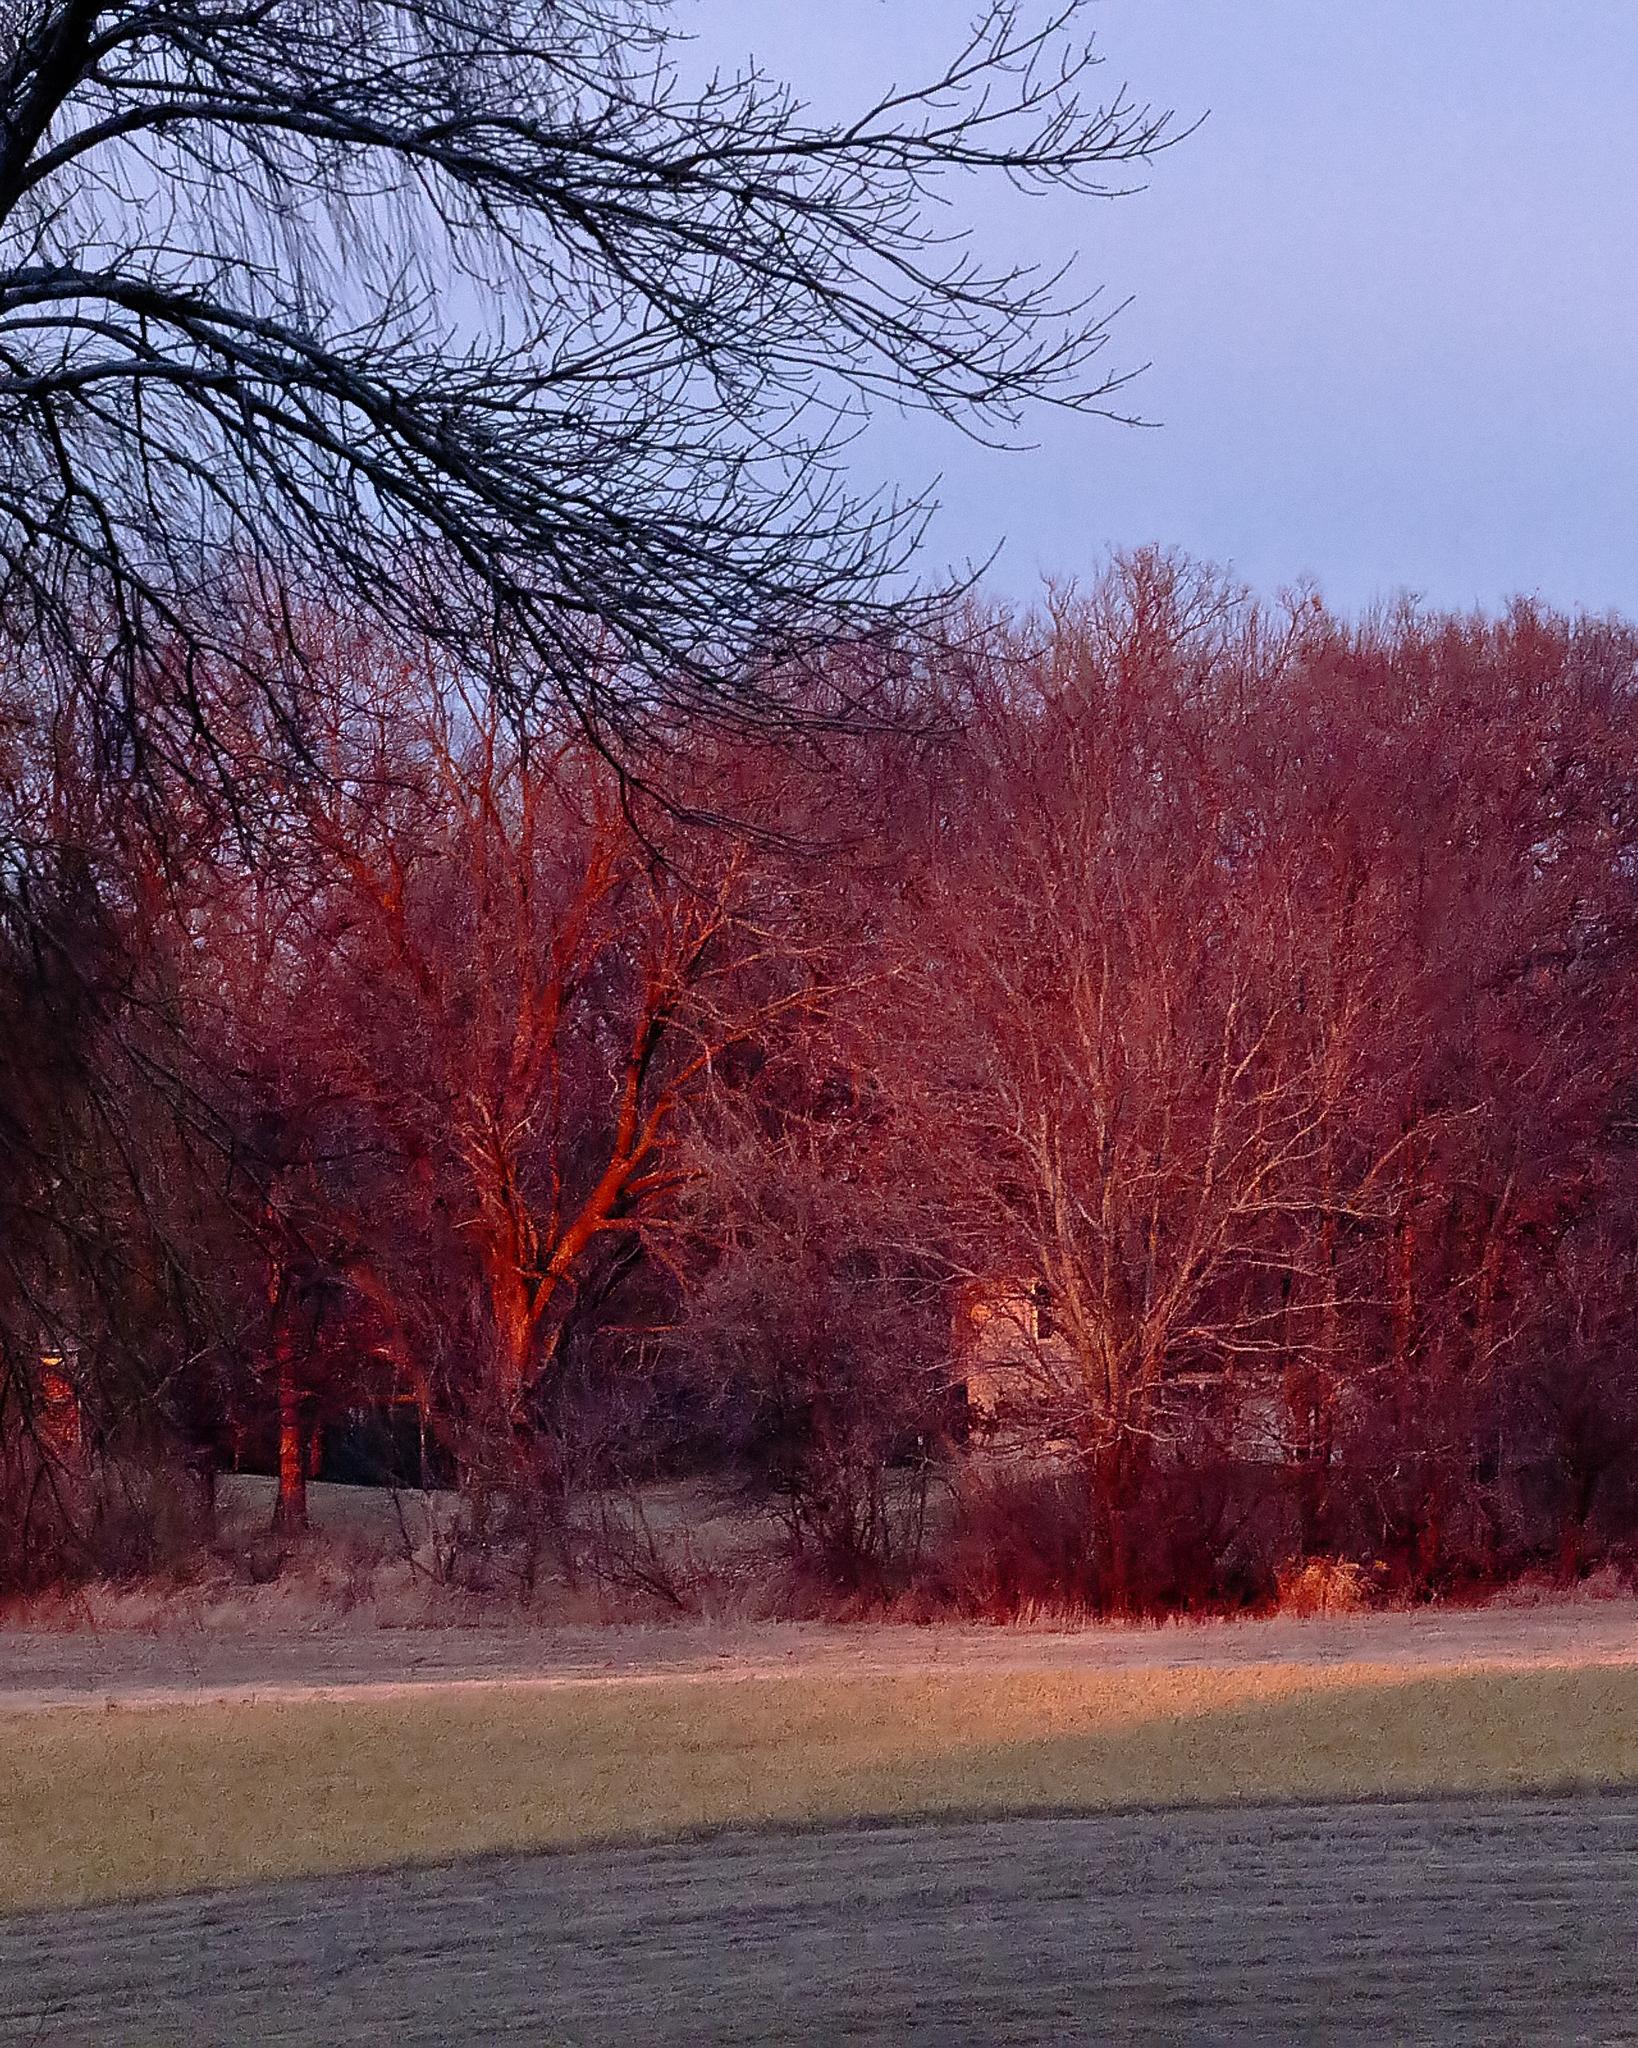 Blazing Sunset by BadgerBob